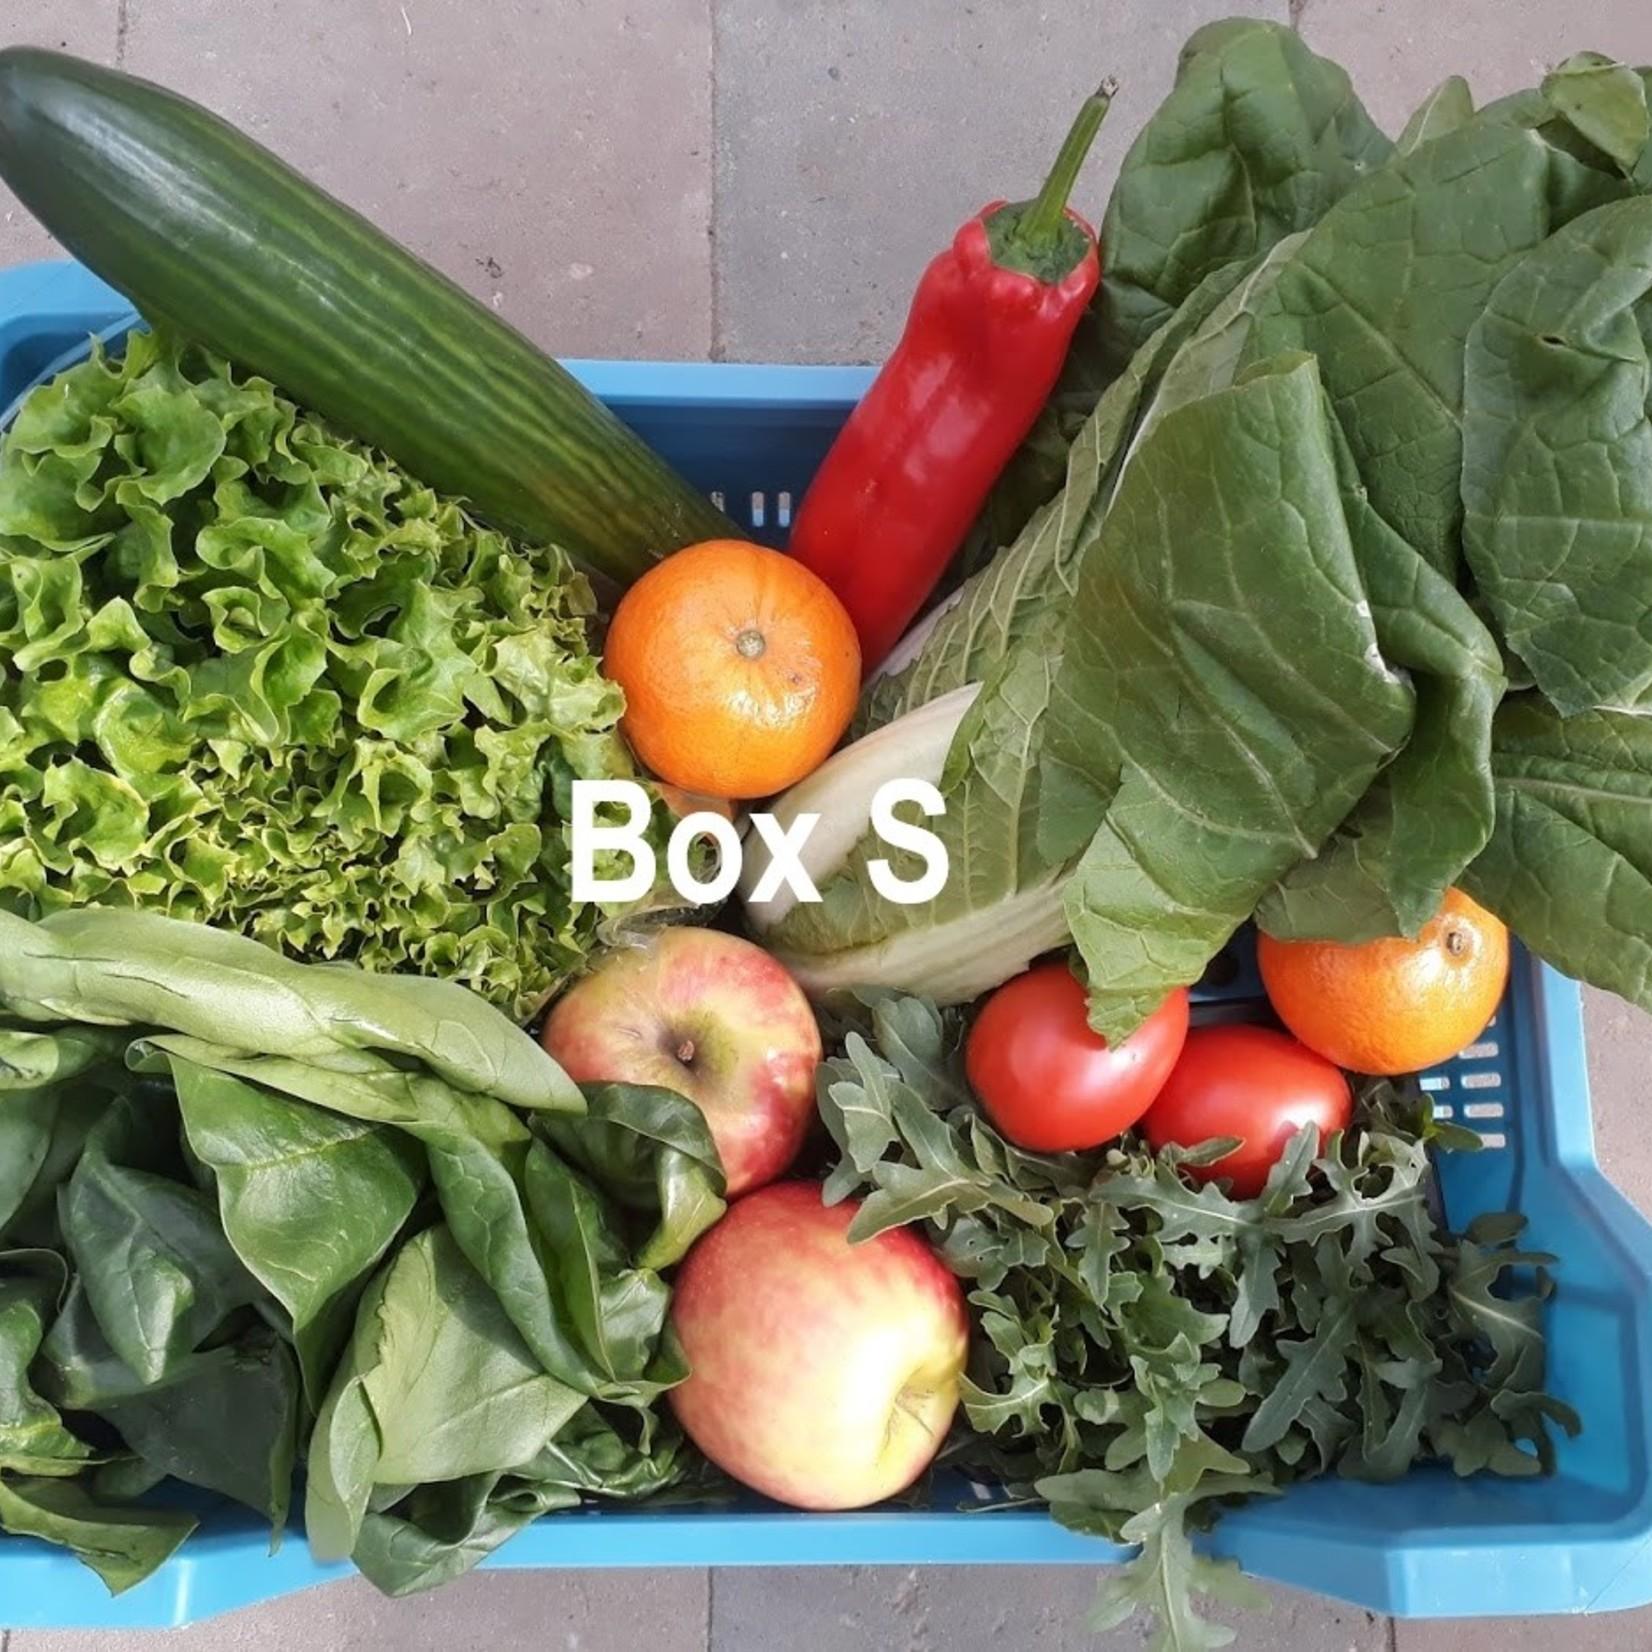 Groente/Fruitbox | Small (De Groene Schuur)